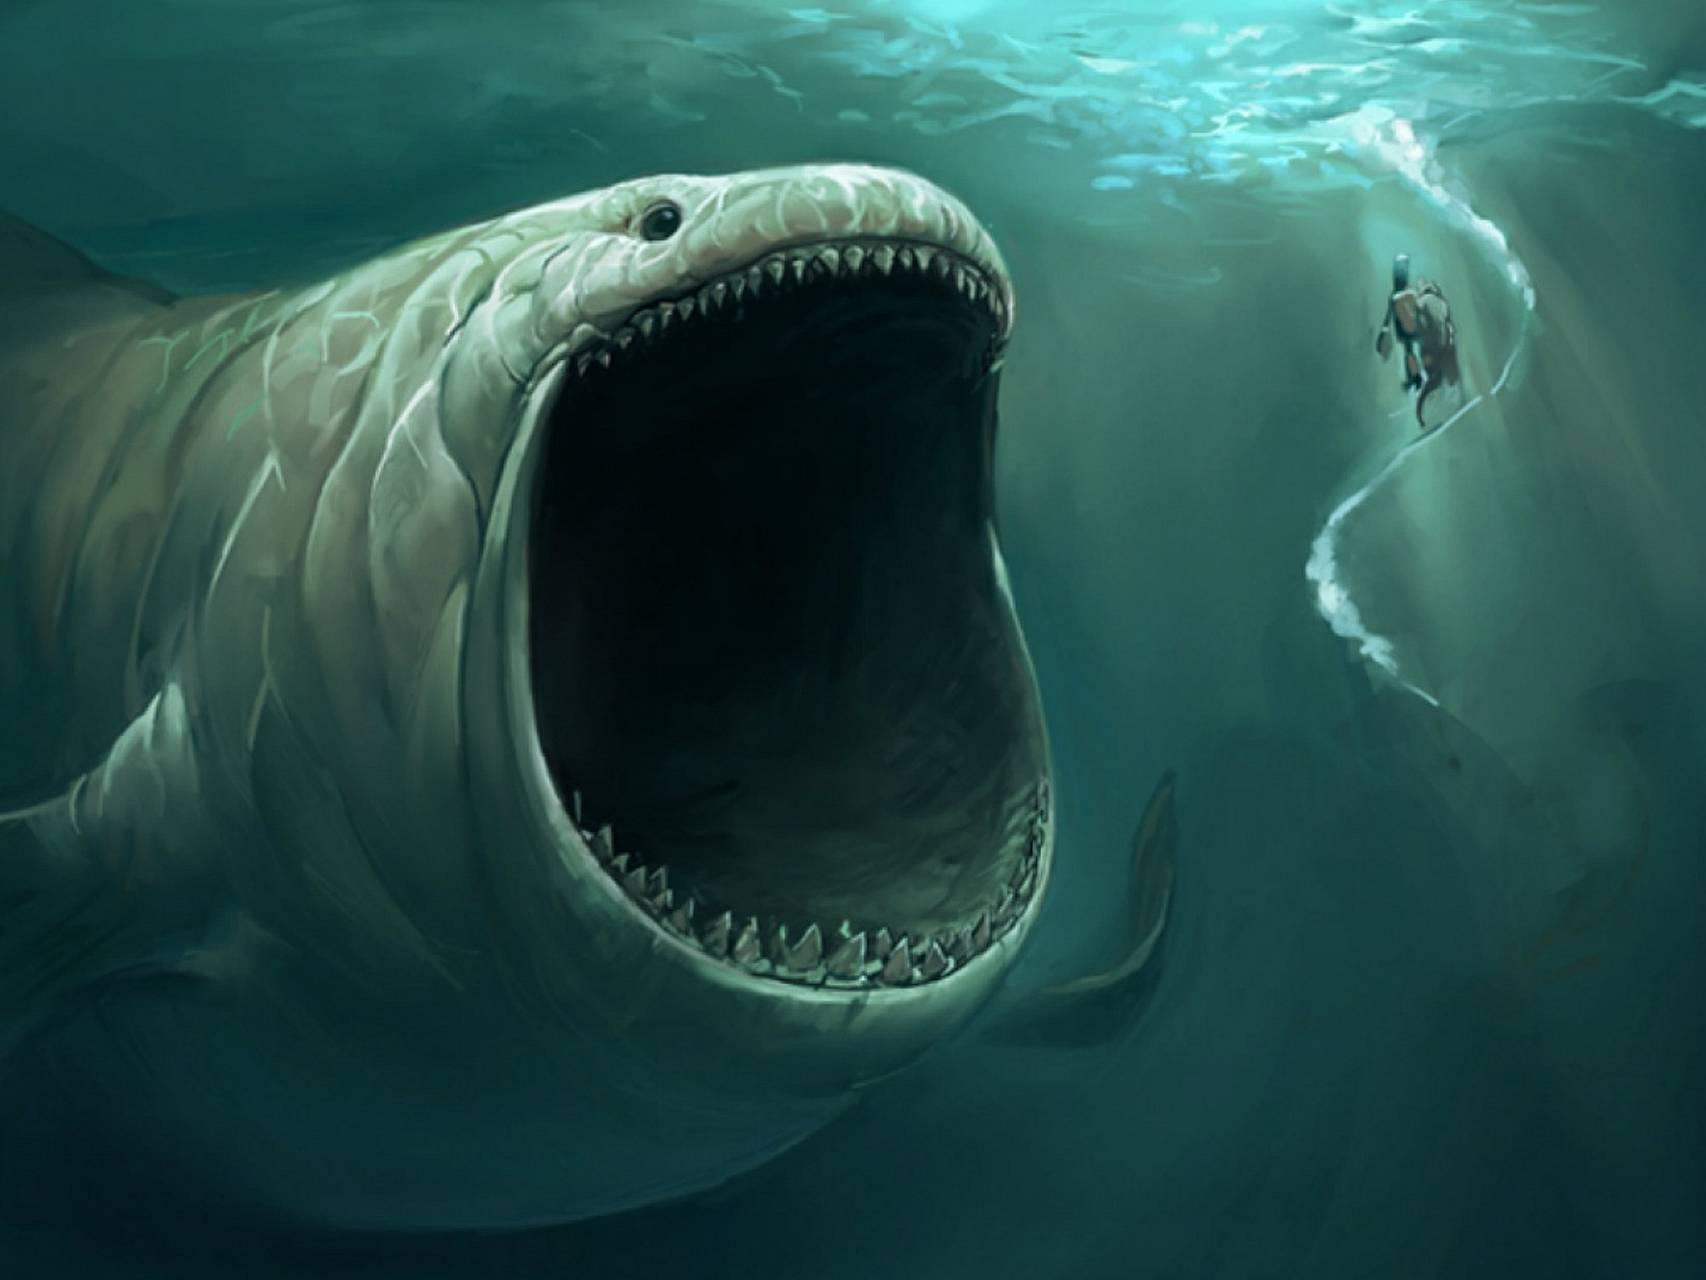 Giant Water Monster